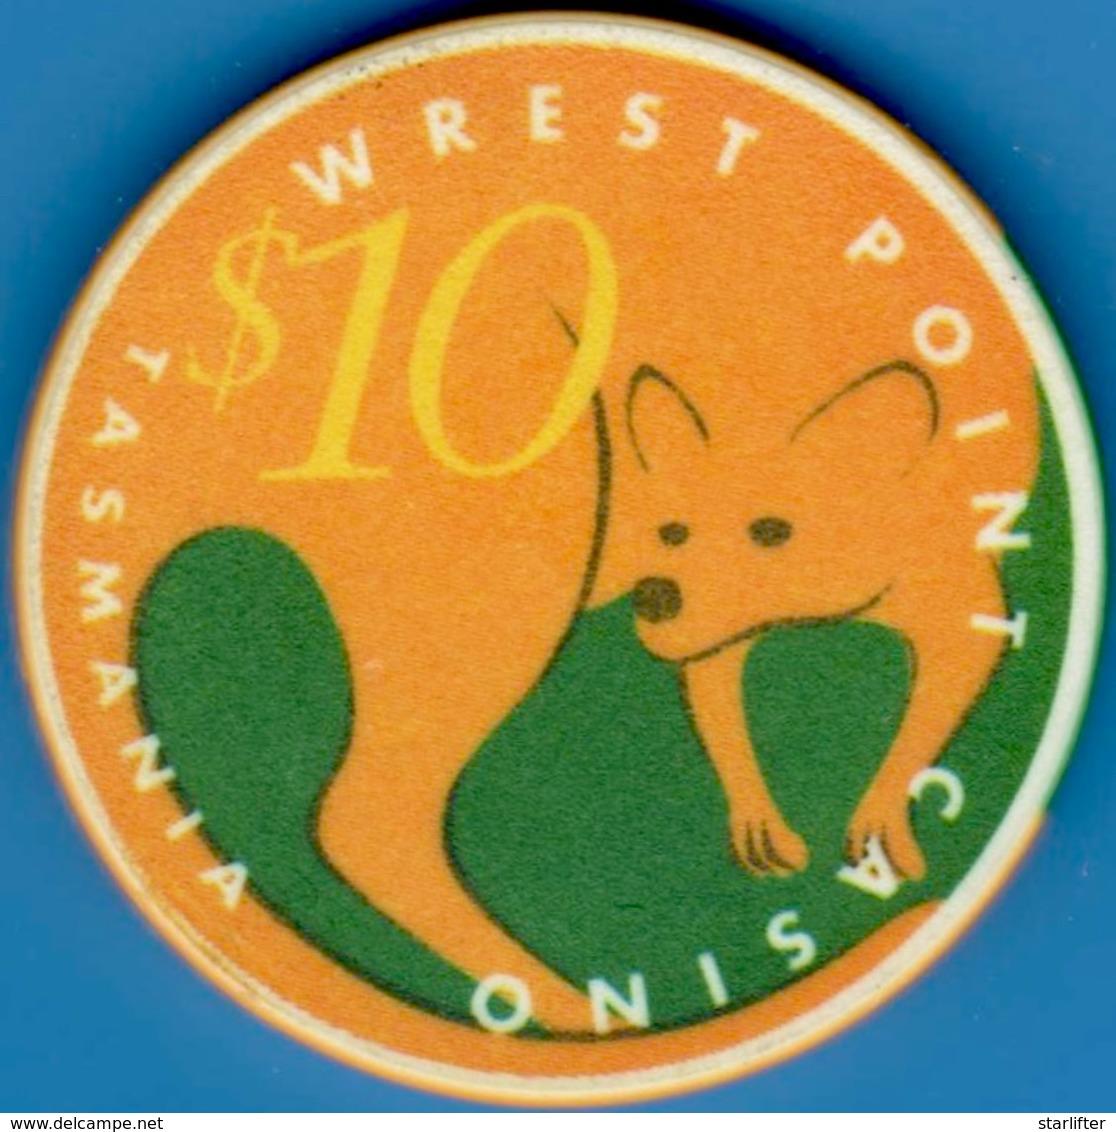 $10 Casino Chip. Wrest Point, Sandy Point, Tasmania. L19. - Casino